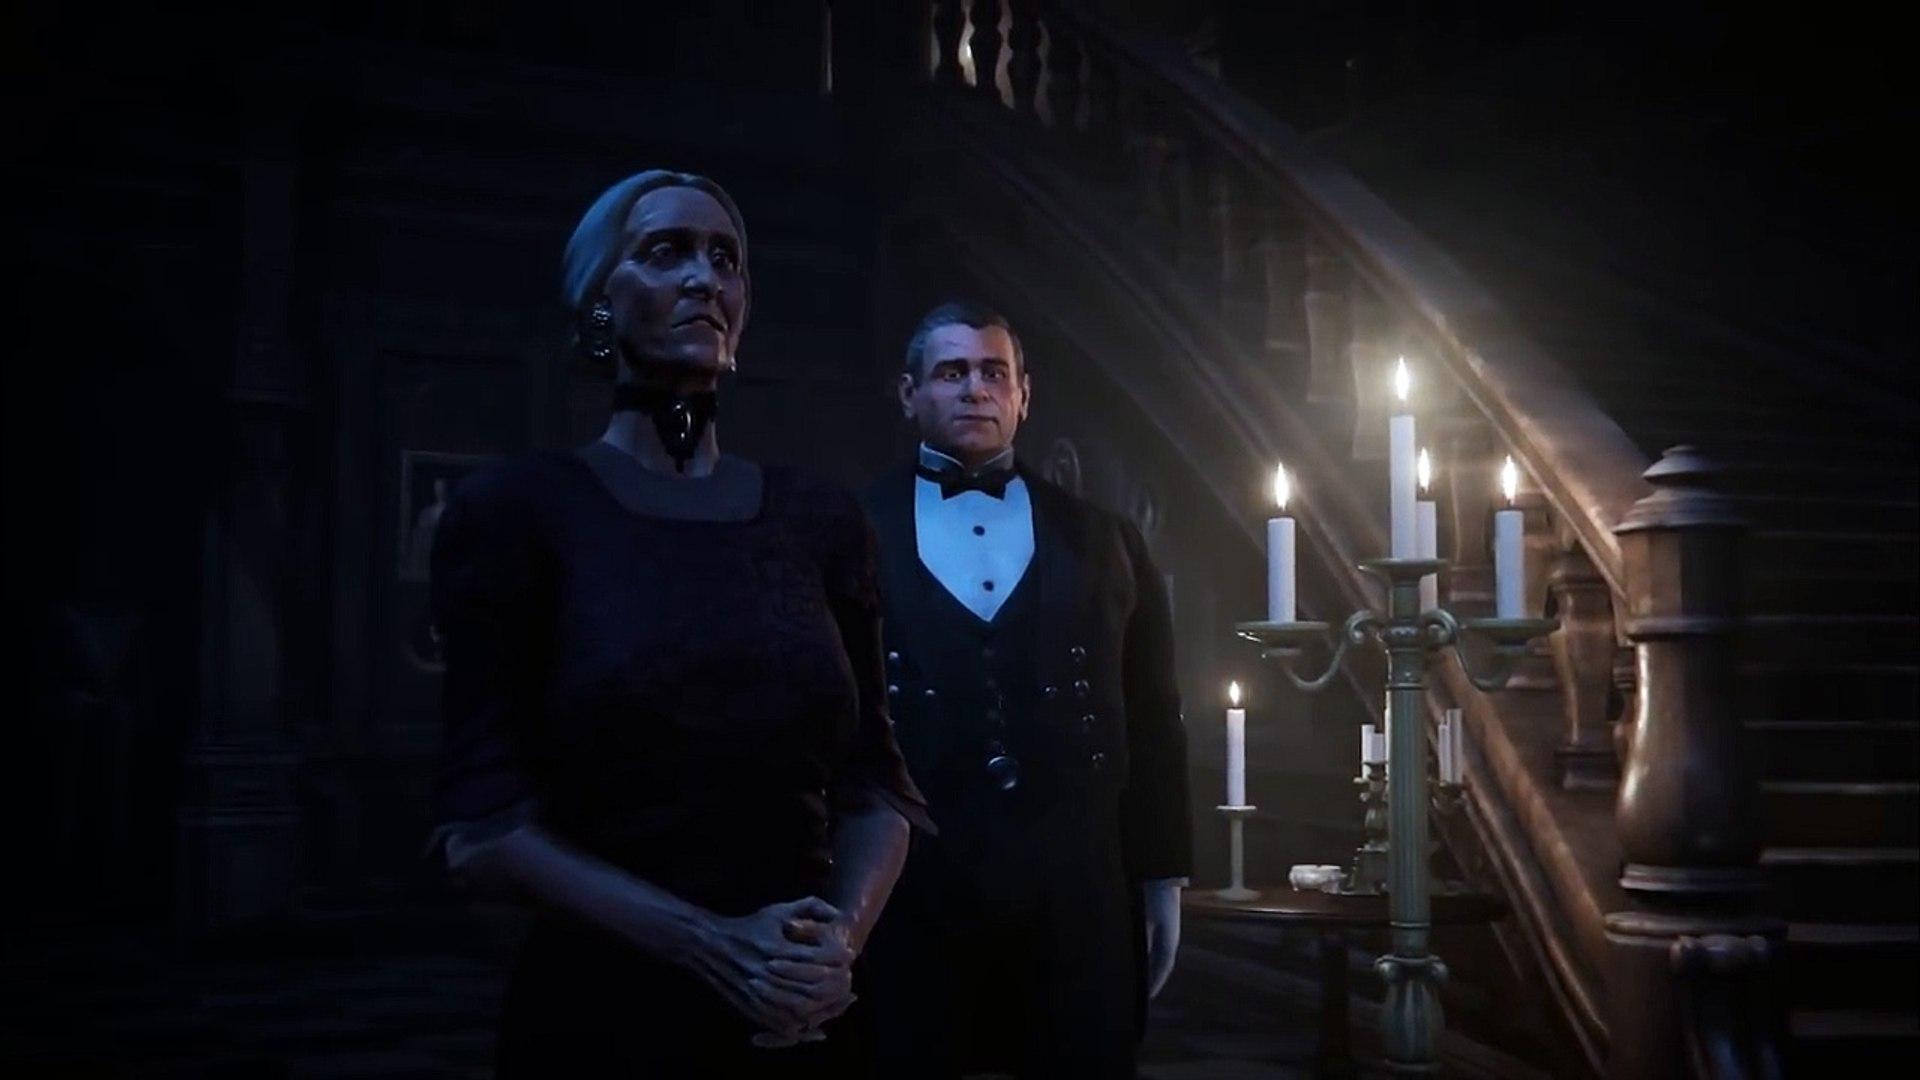 Black Mirror Gameplay Trailer (New Gothic Horror Game 2017)